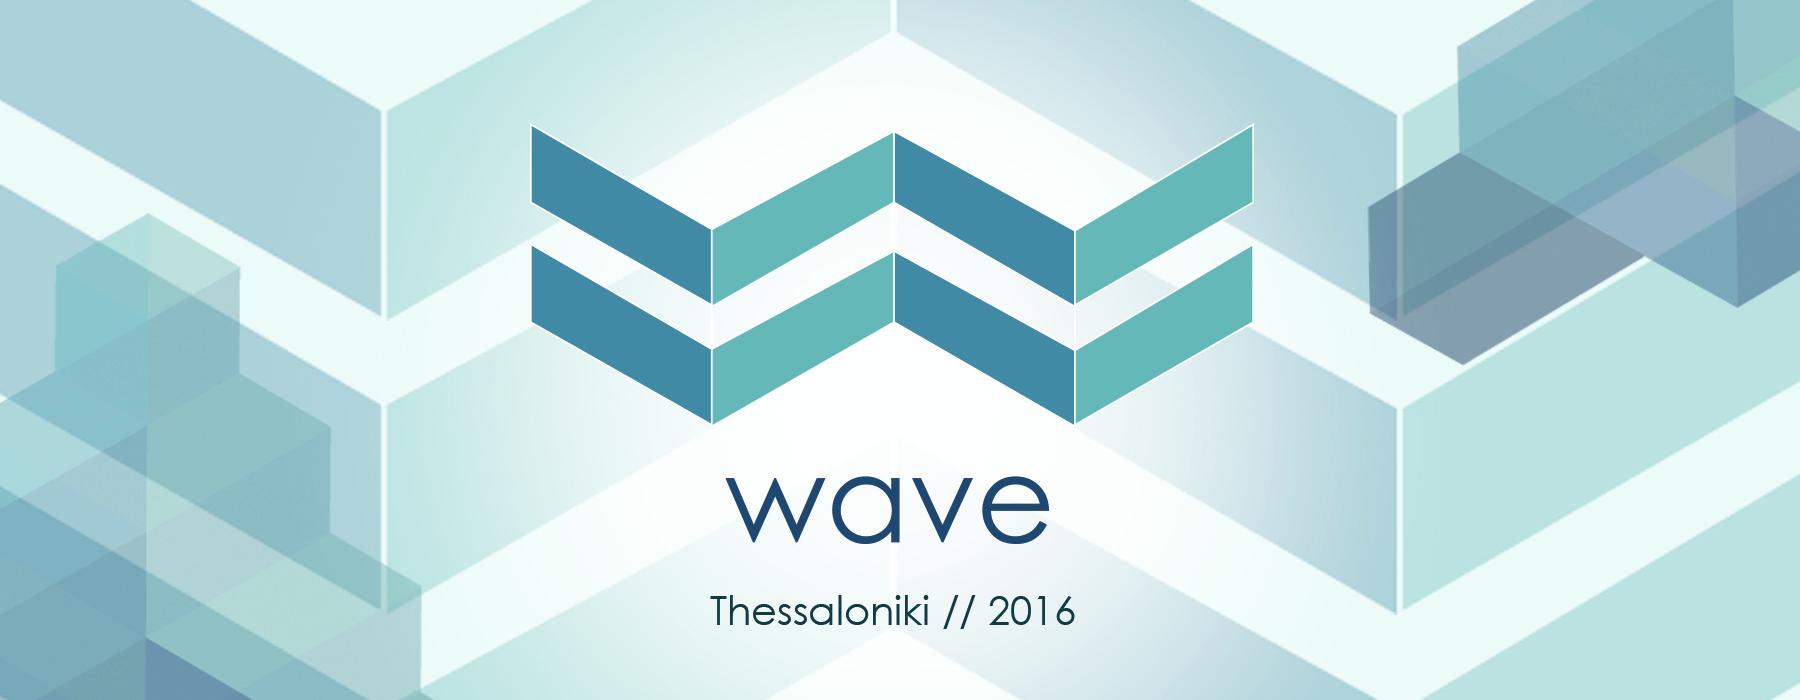 WAVE 2016: Ένα πρότυπο εκθεσιακό συνέδριο στη Θεσσαλονίκη